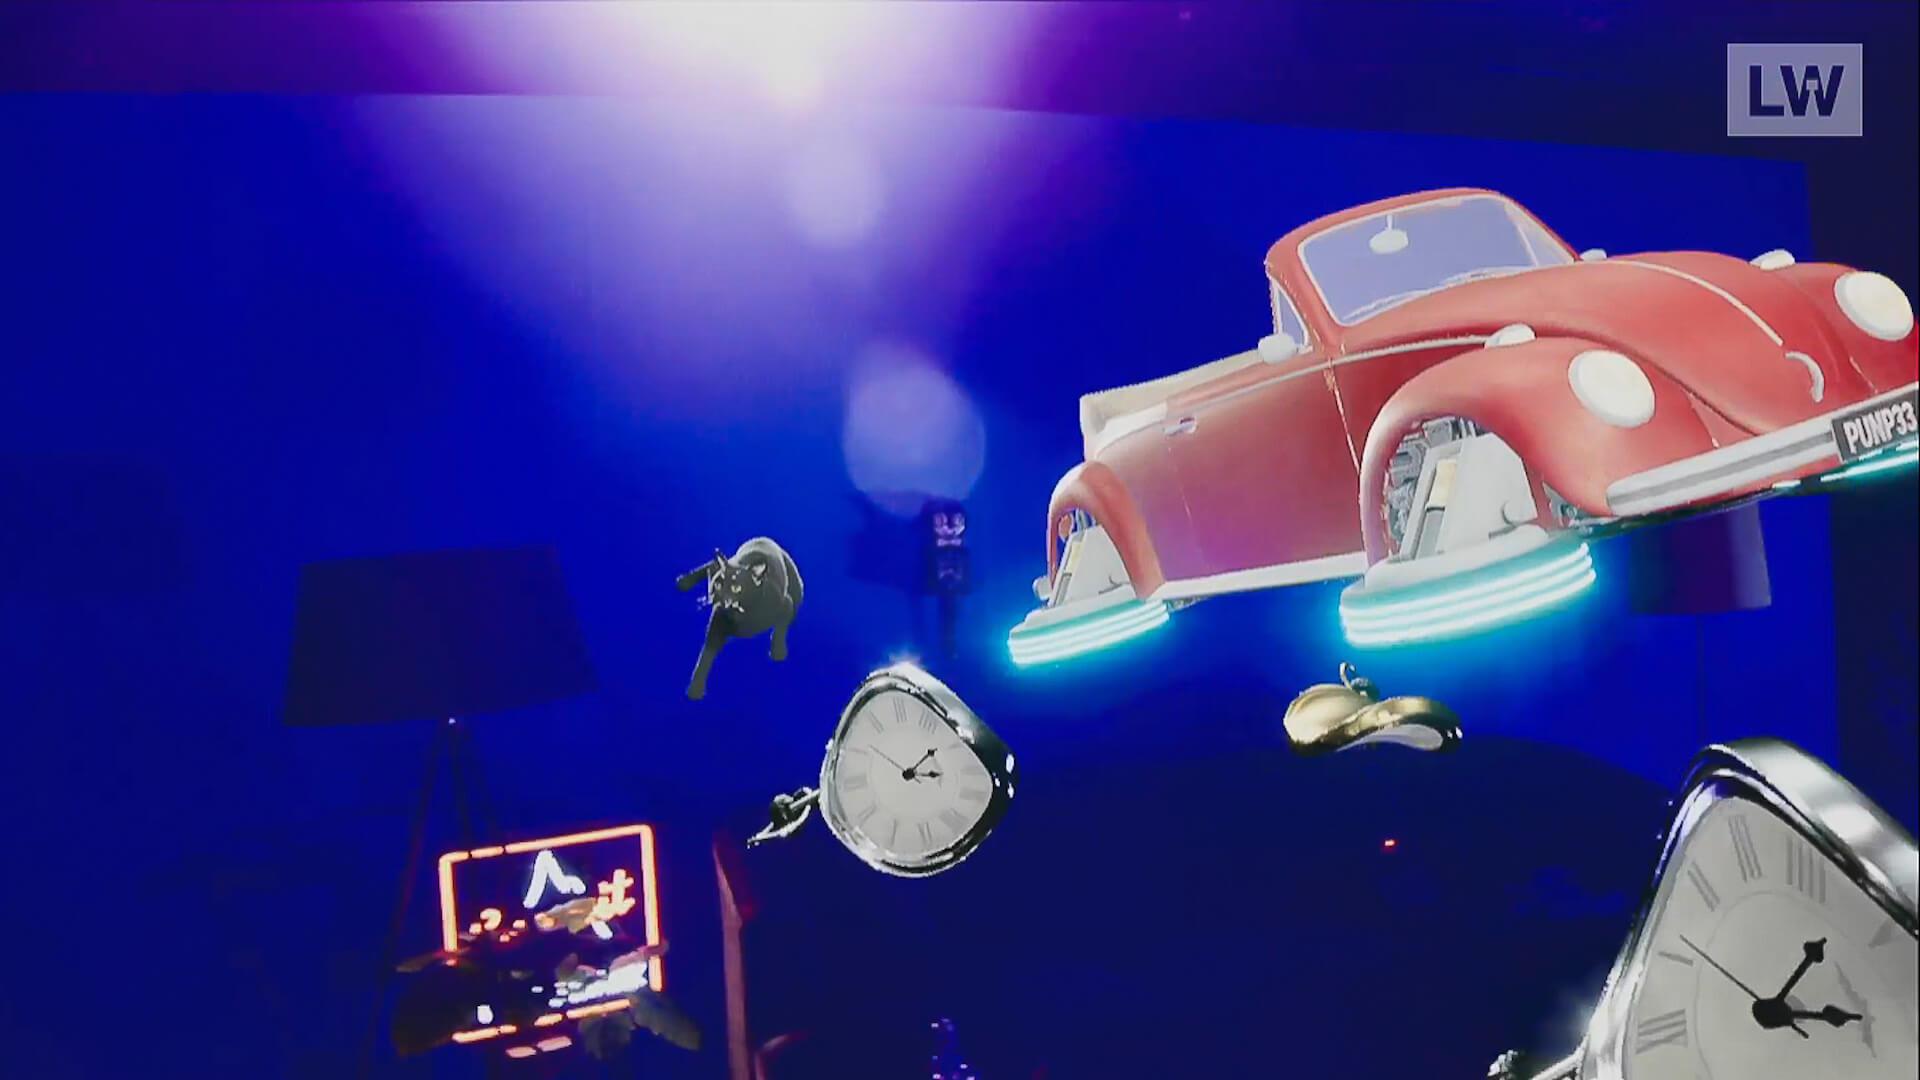 LIVEWIRE PUNPEE<Sofa Kingdomcome>のイースターエッグを一挙紹介! by みやーんZZ music200918_punpee_livewire_12